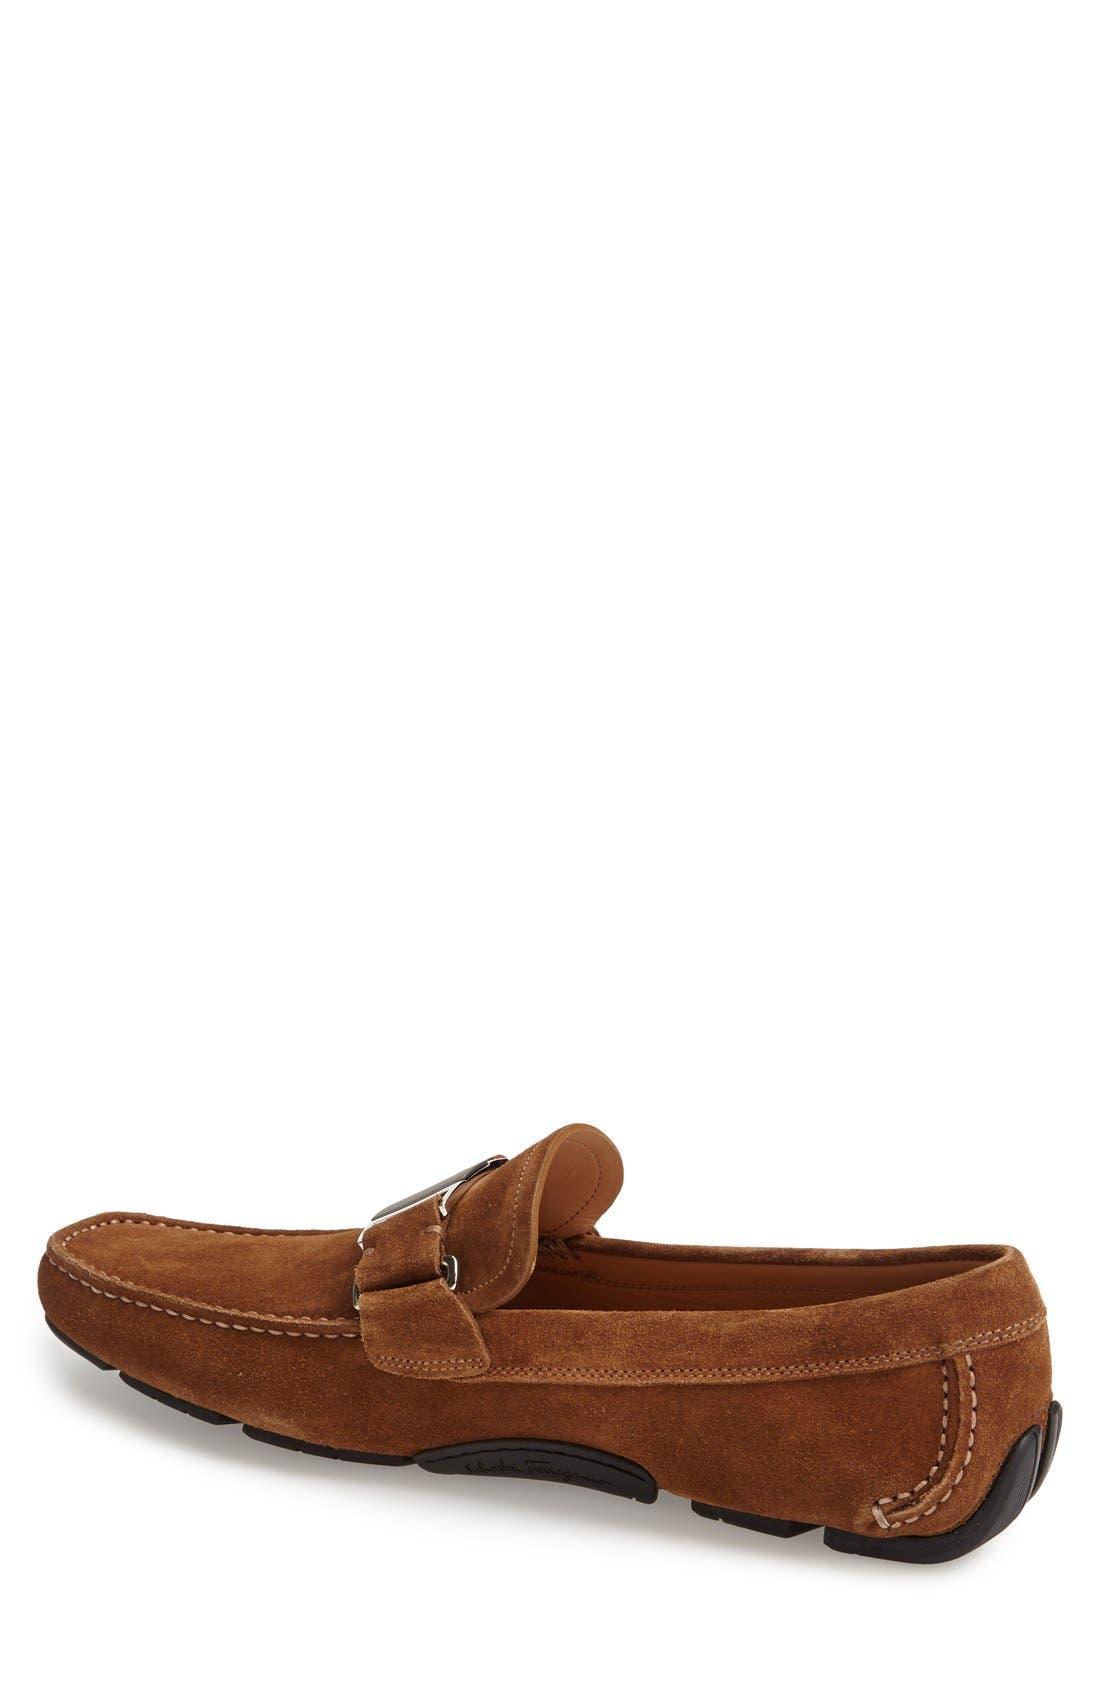 c3fcb029724 Salvatore Ferragamo Men s Loafers   Slip-ons